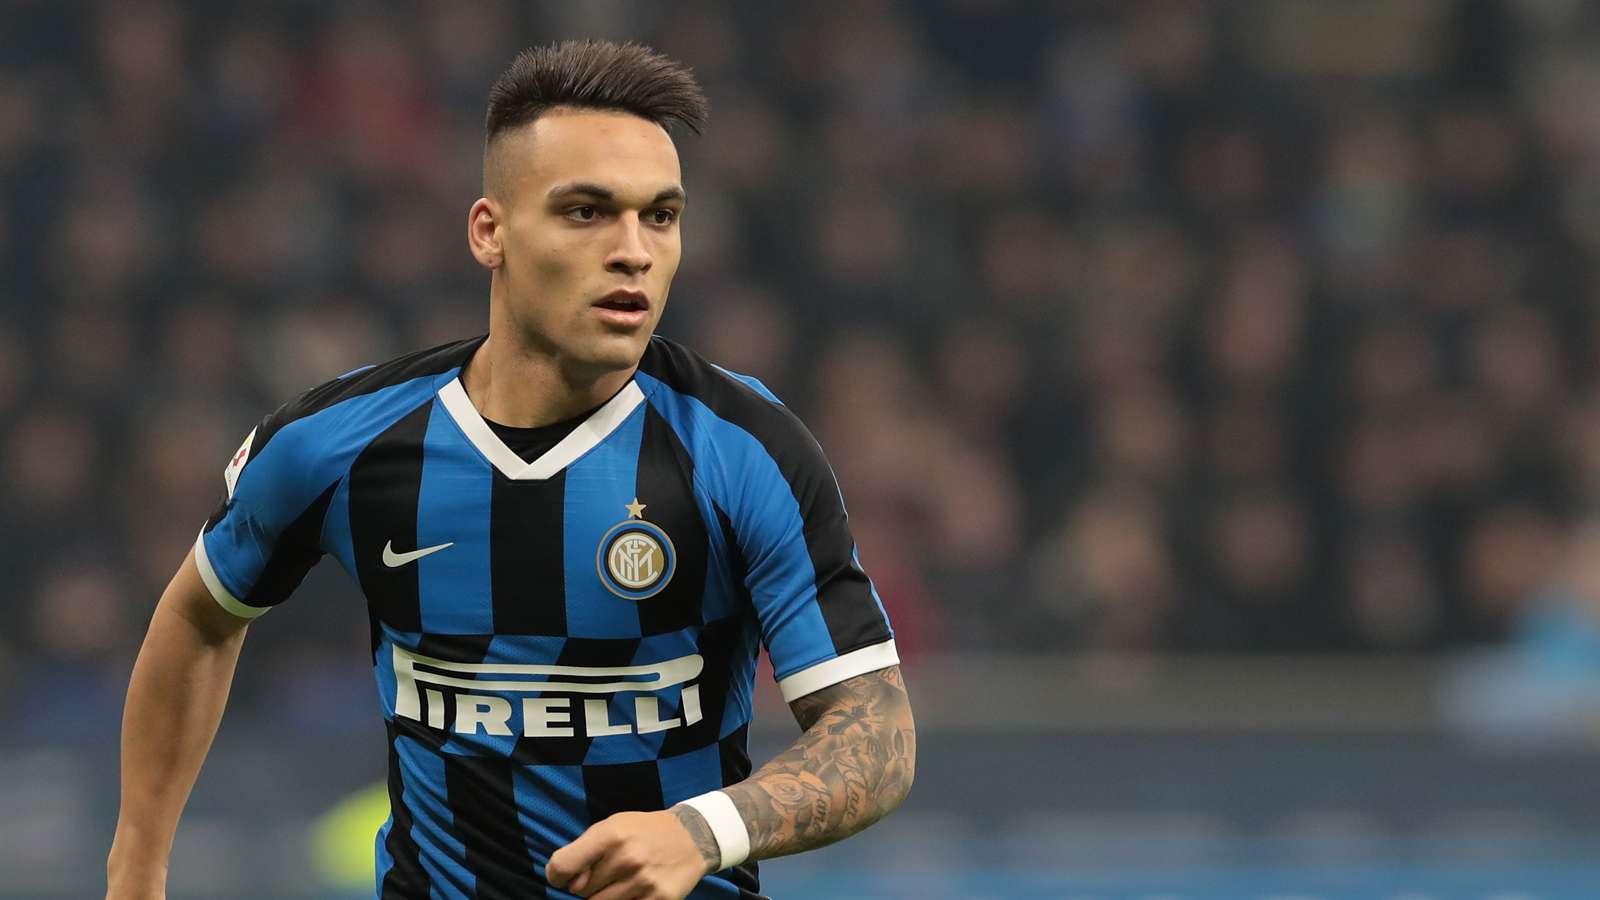 Inter Milan Tolak Tawaran Mewah Barcelona Untuk Lautaro Martinez